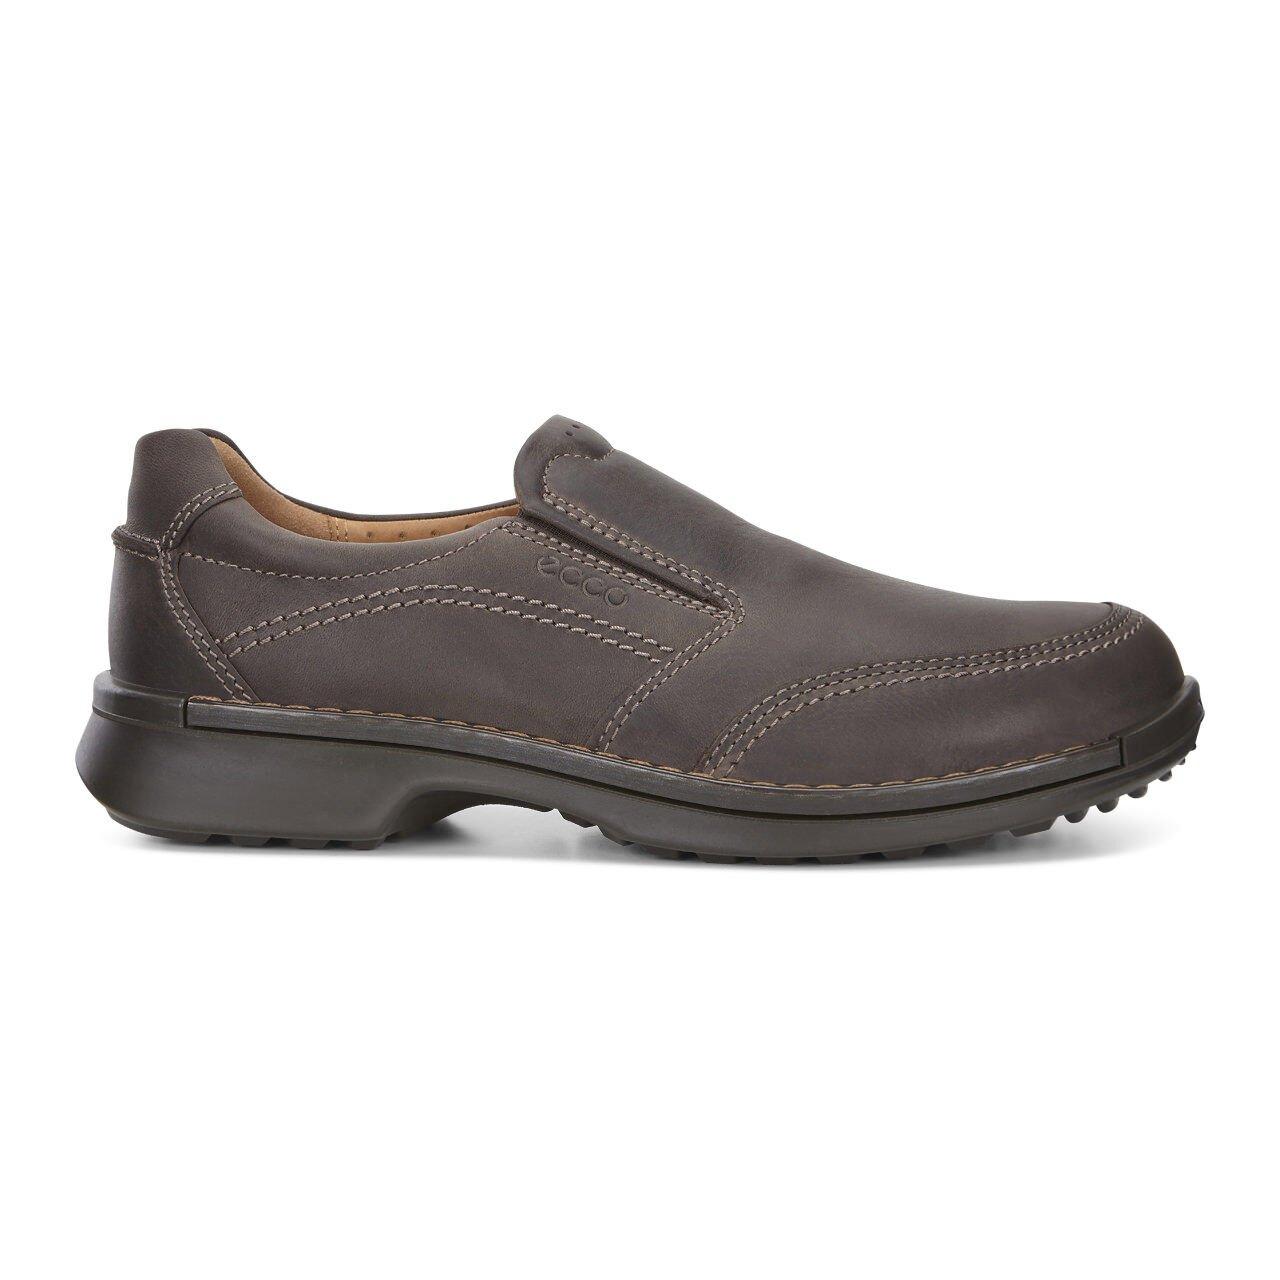 ECCO Fusion II Slip On | Men's Shoes